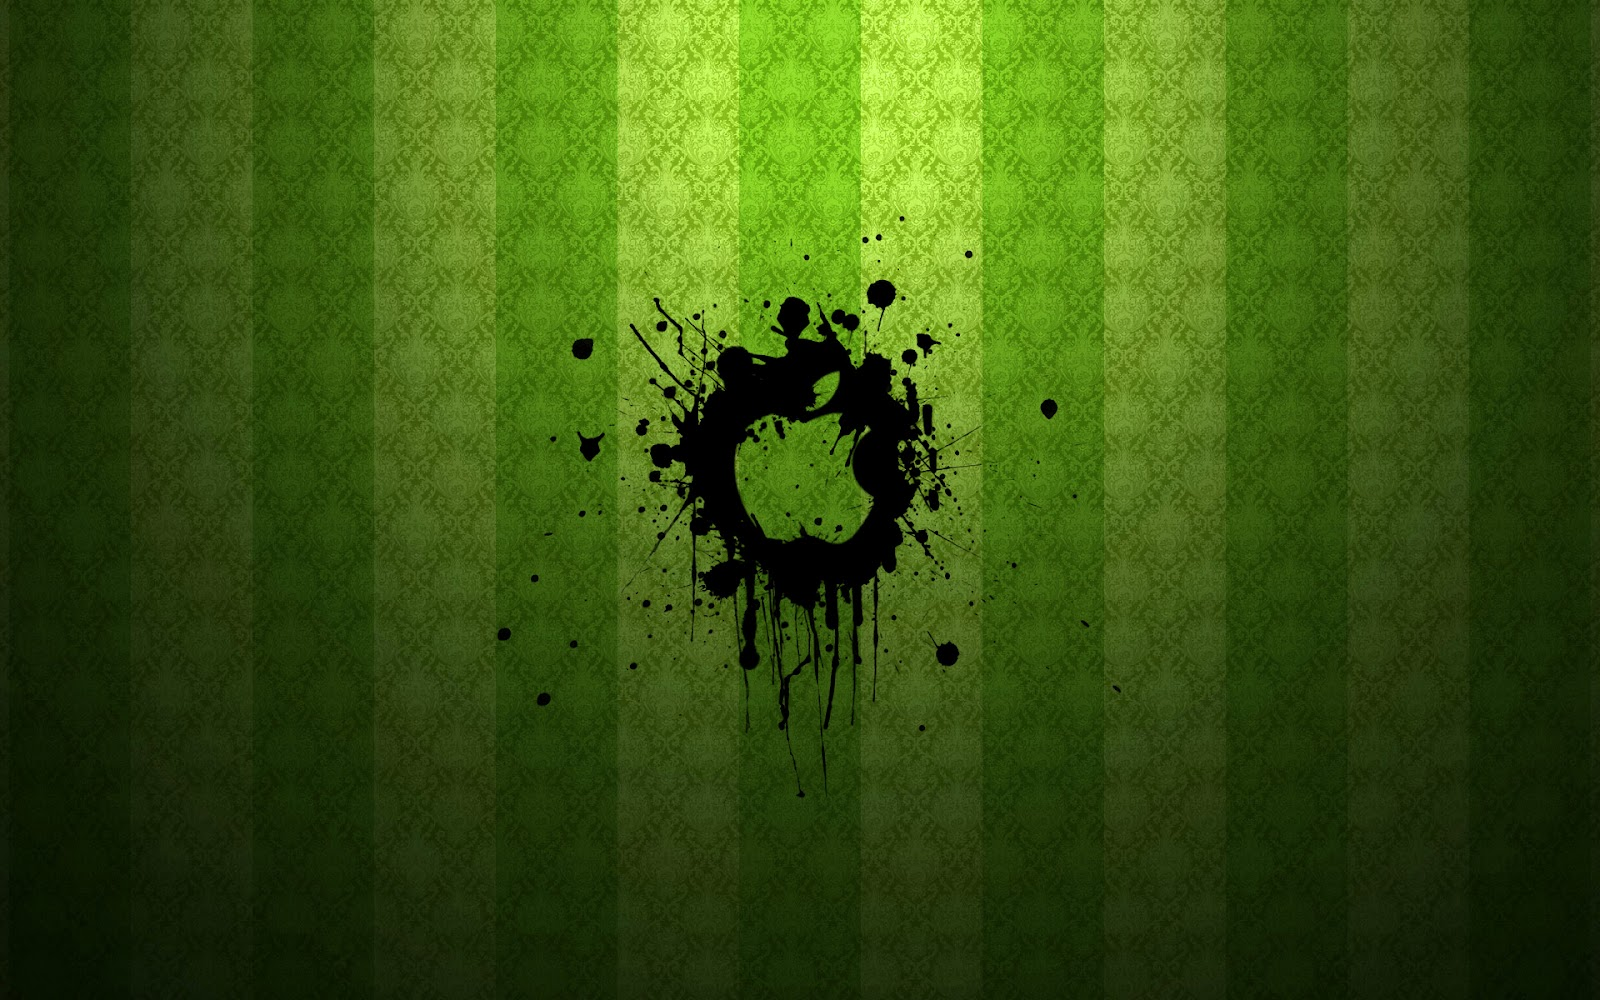 http://1.bp.blogspot.com/-fP_2nGhClHI/UD3TZb3s2eI/AAAAAAAAARc/wsdZAkv4VEY/s1600/Green+colour+wallpaper+with+apple+logo+in+black+shades.jpg